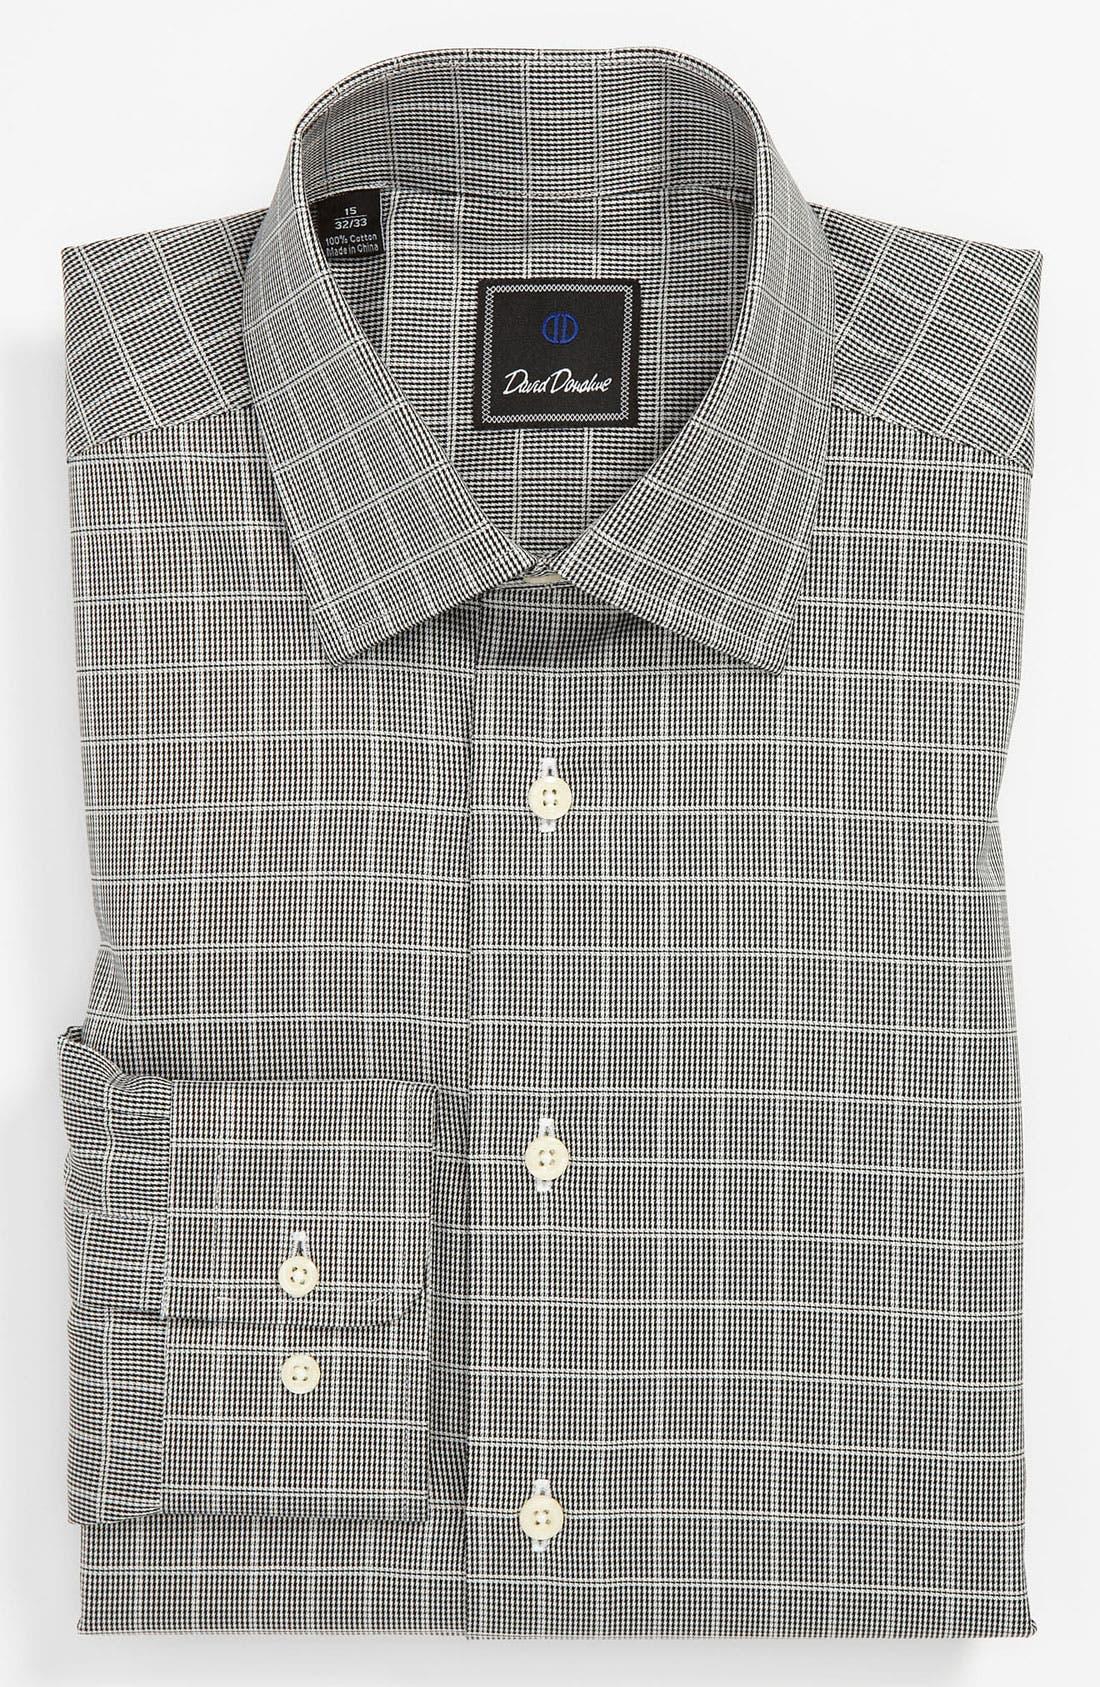 Alternate Image 1 Selected - David Donahue Regular Fit Dress Shirt (Online Exclusive)